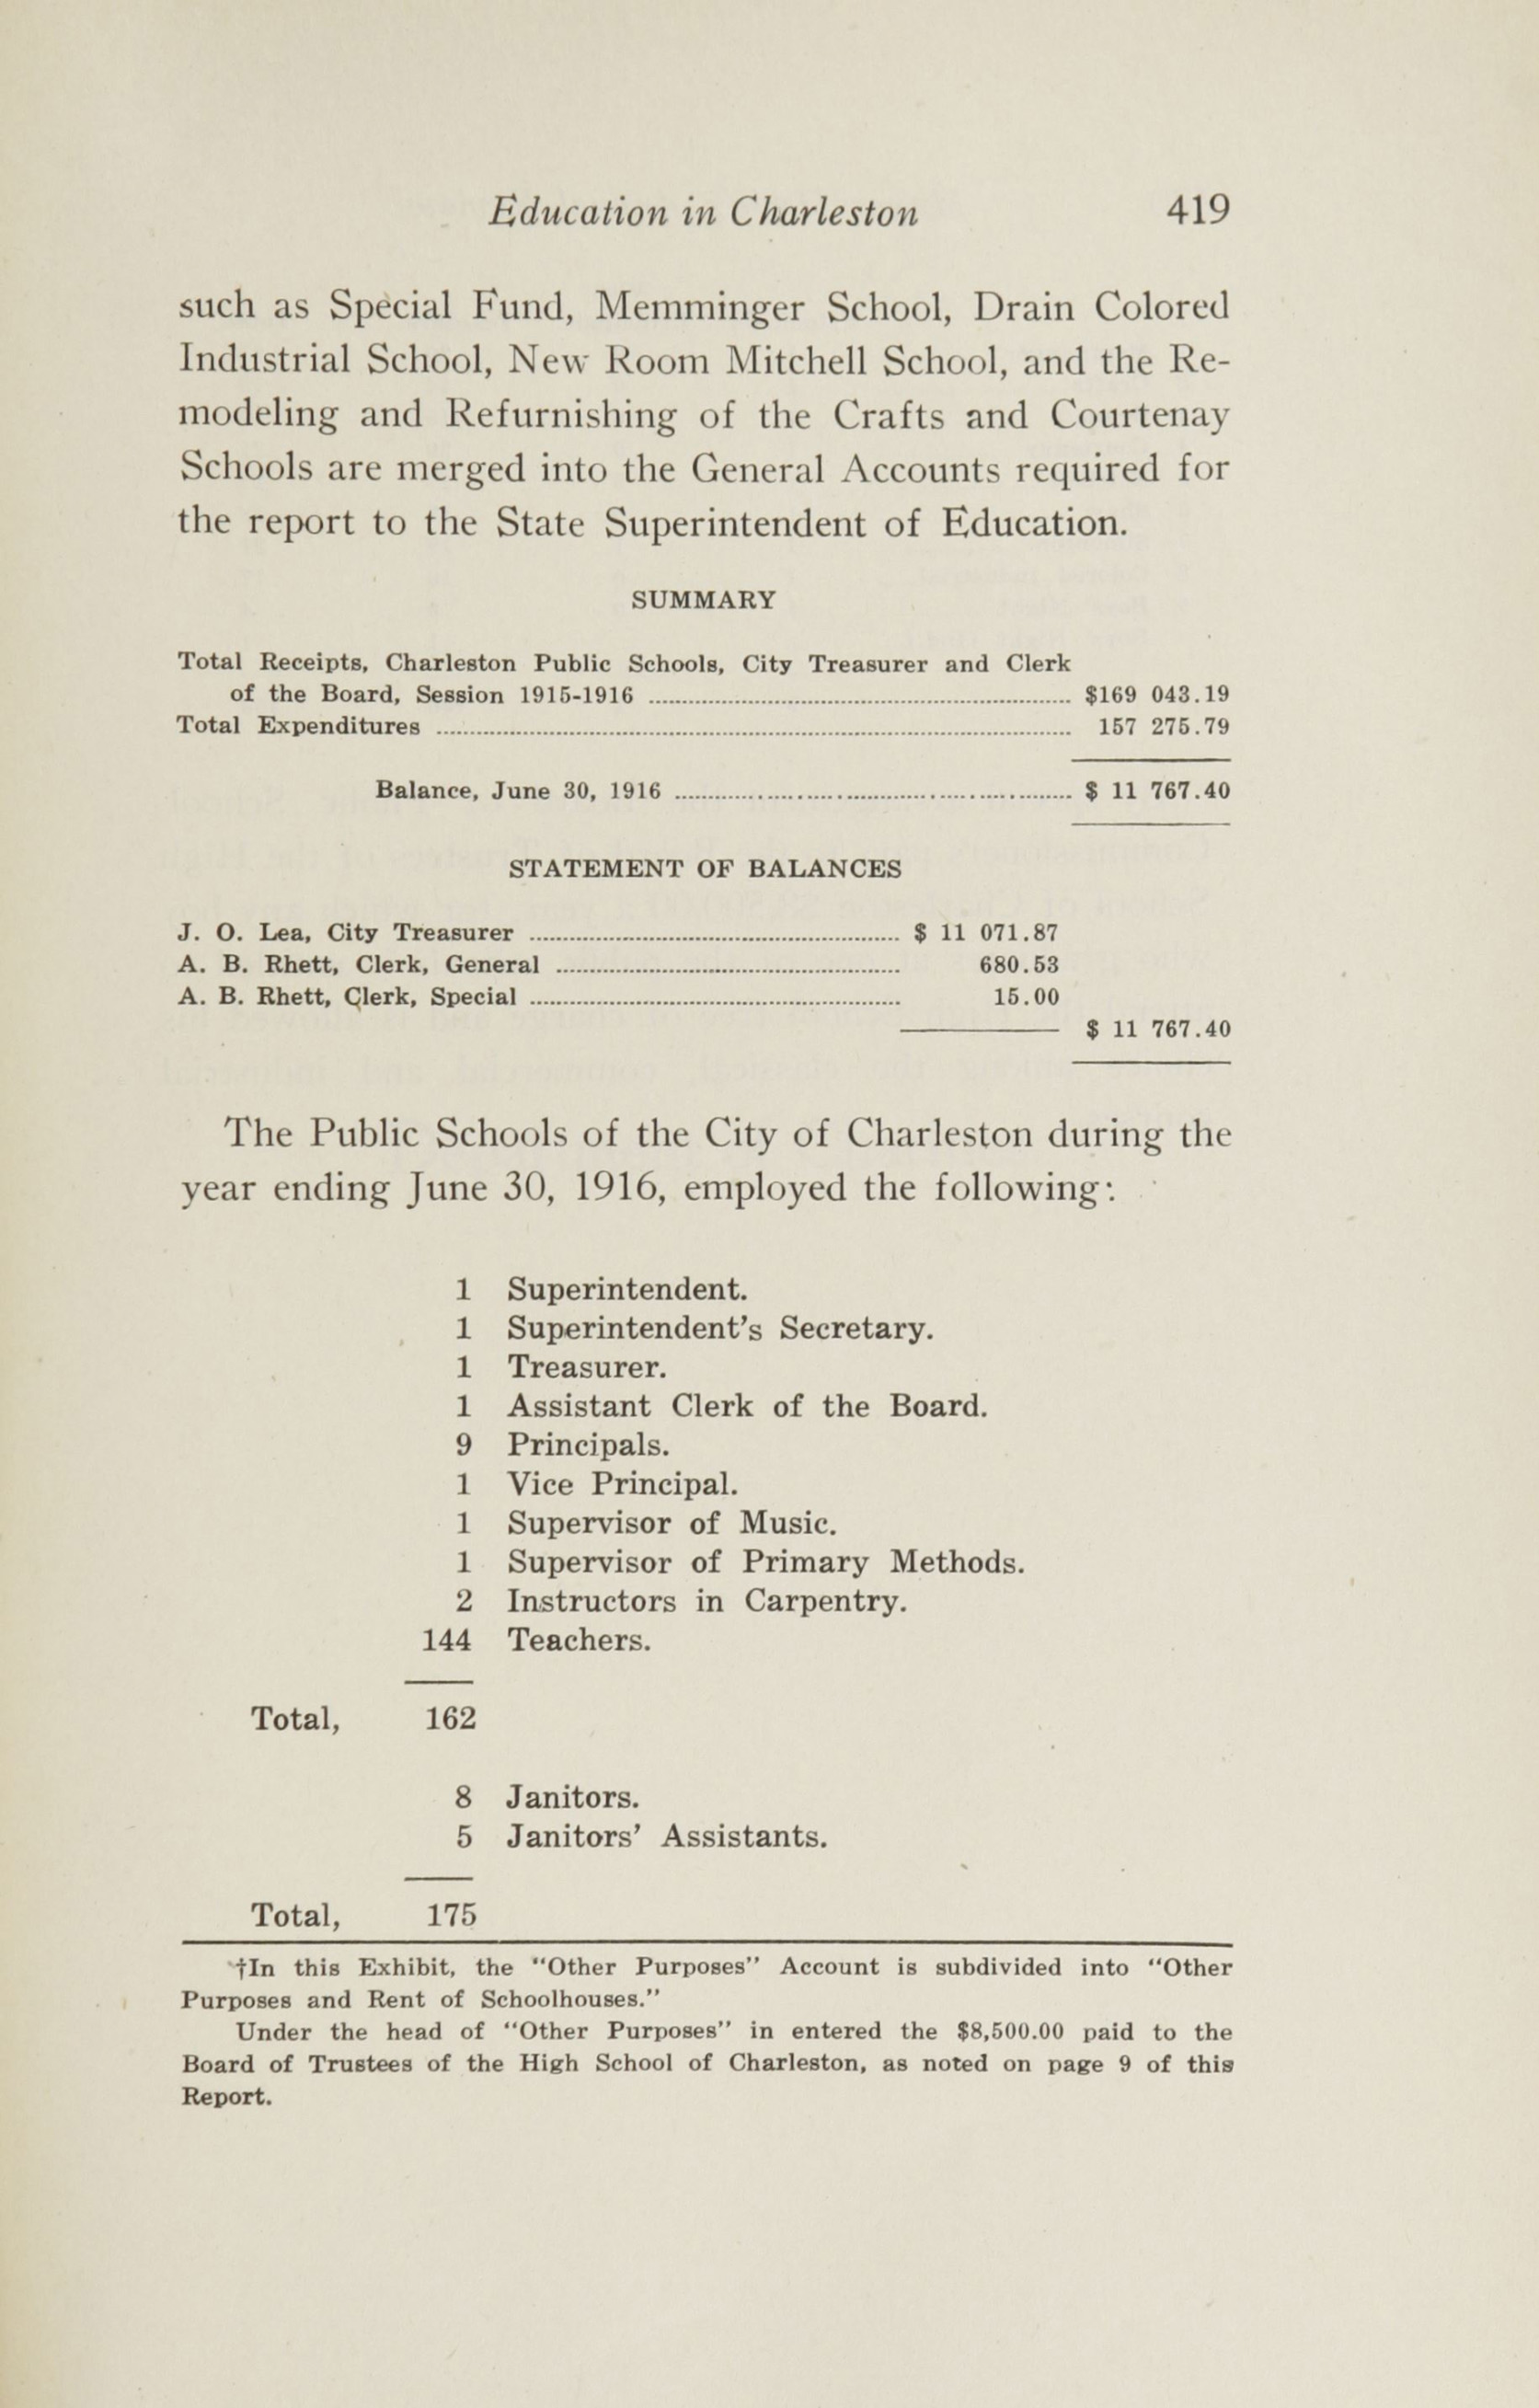 Charleston Yearbook, 1916, page 419